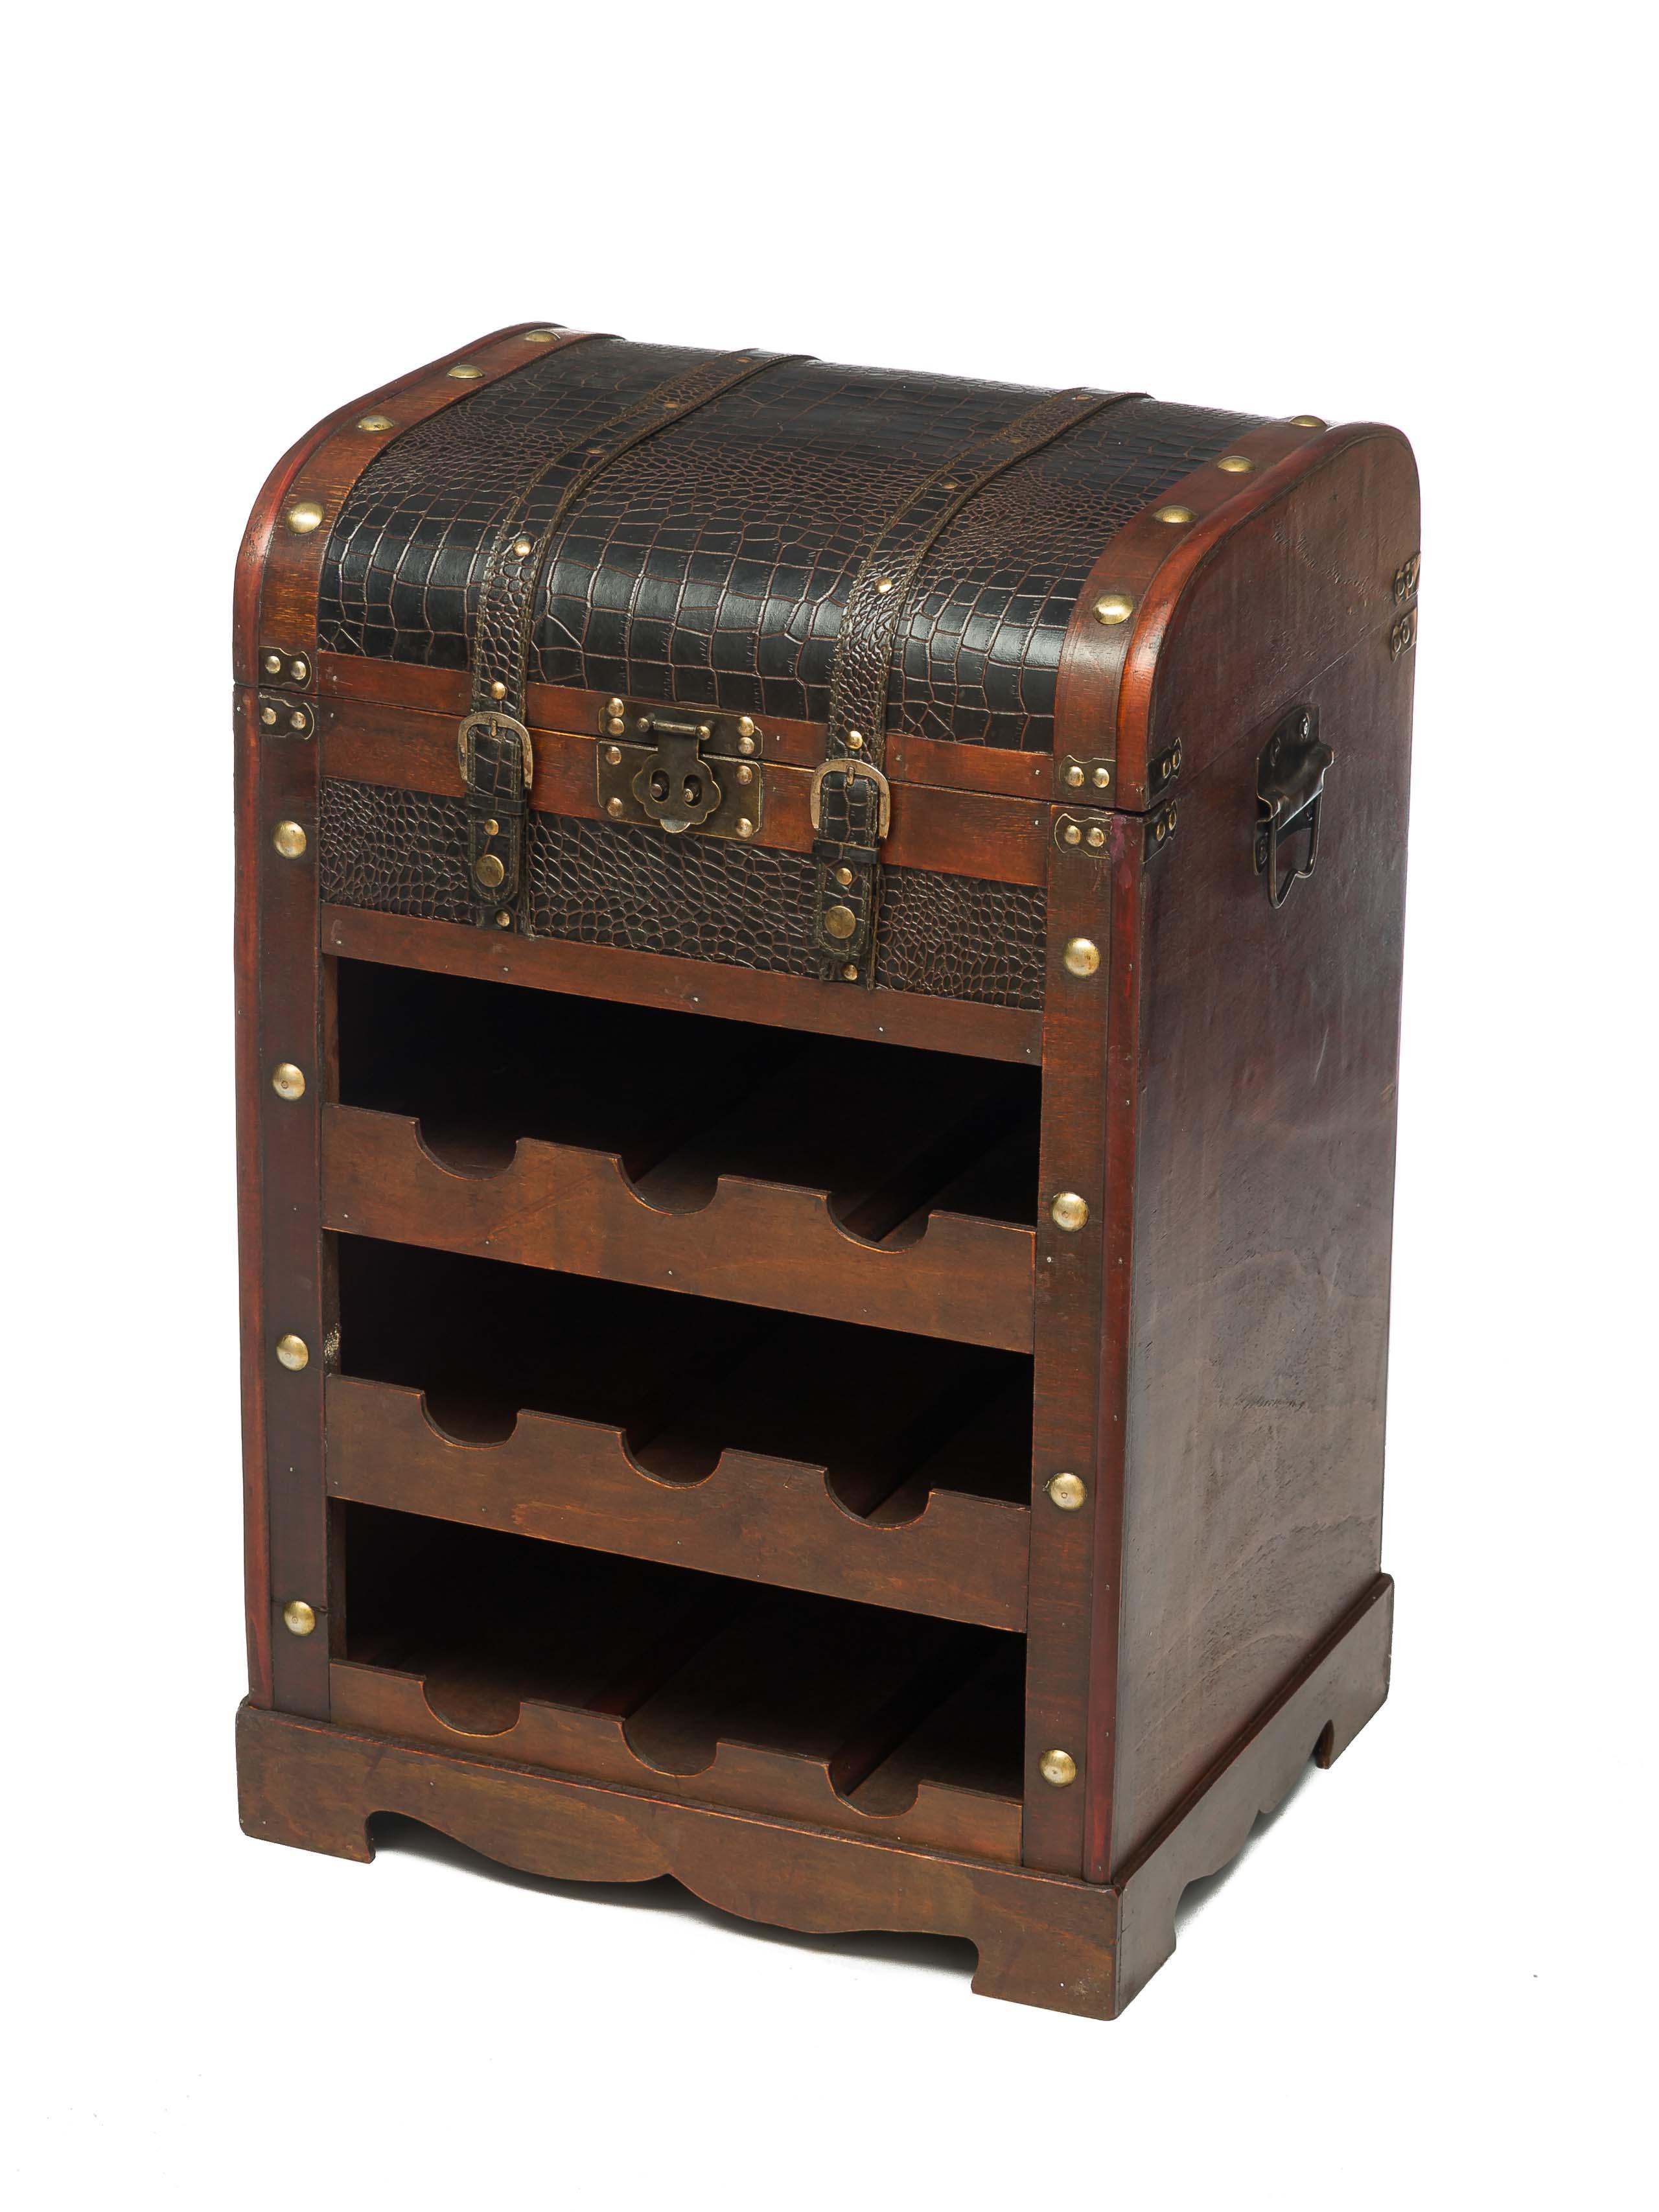 weinregal flaschenregal wein antik stil holz weintruhe weinschrank holz koffer aubaho. Black Bedroom Furniture Sets. Home Design Ideas